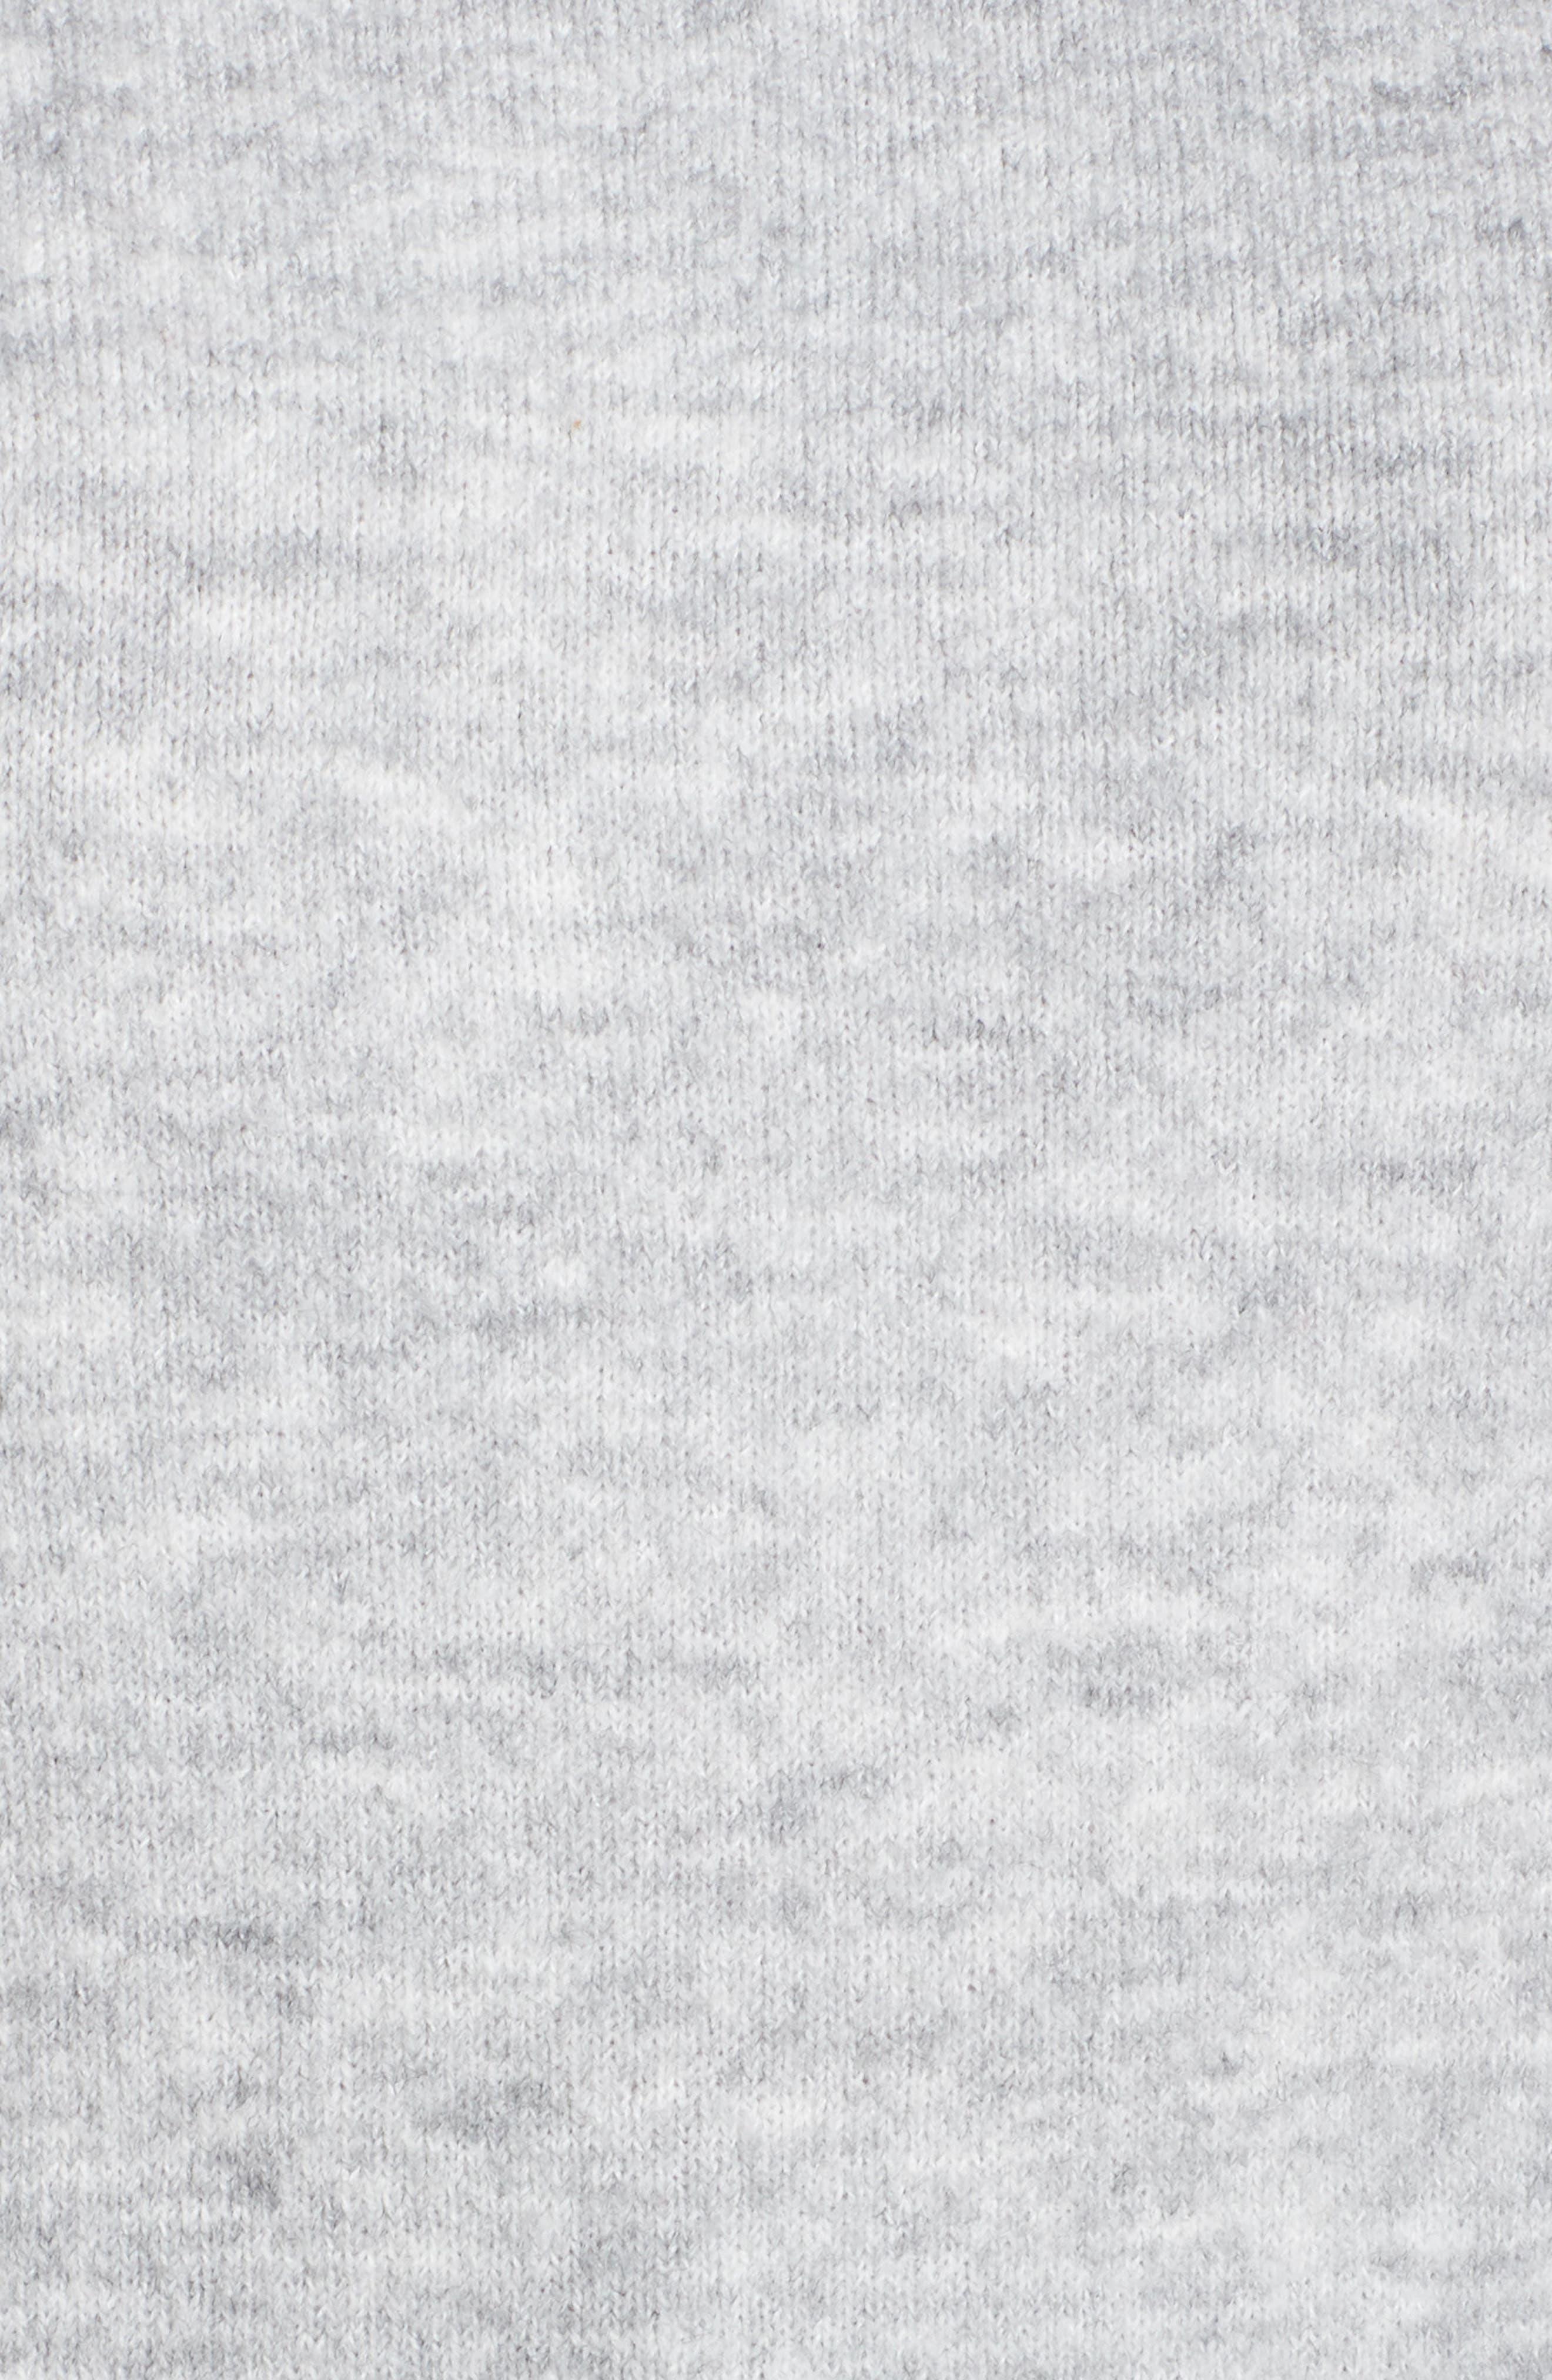 Cozy Crewneck Sweater,                             Alternate thumbnail 5, color,                             GREY HEATHER